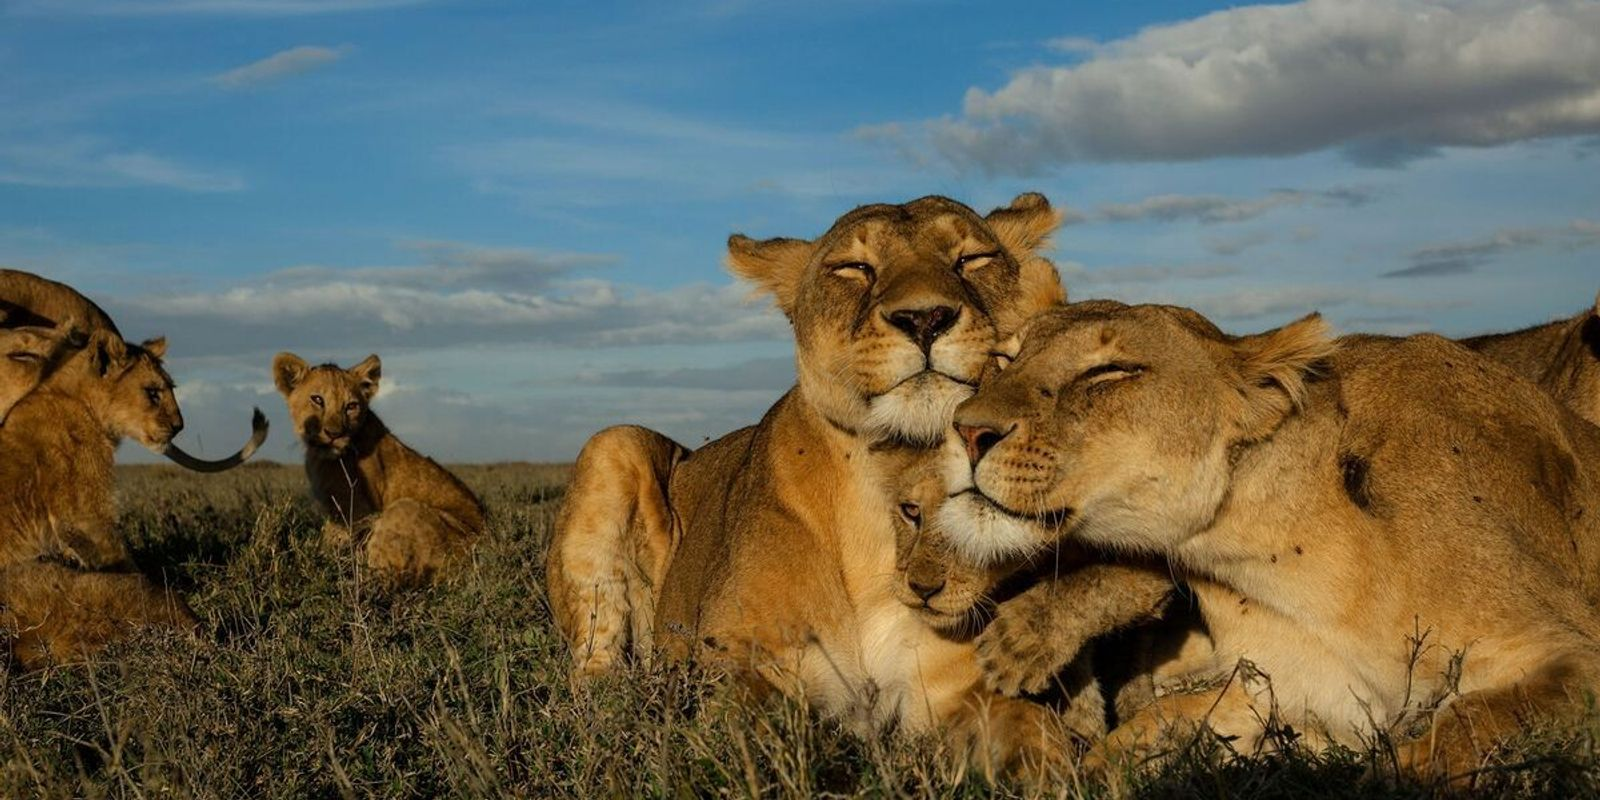 Protecting Big Cats